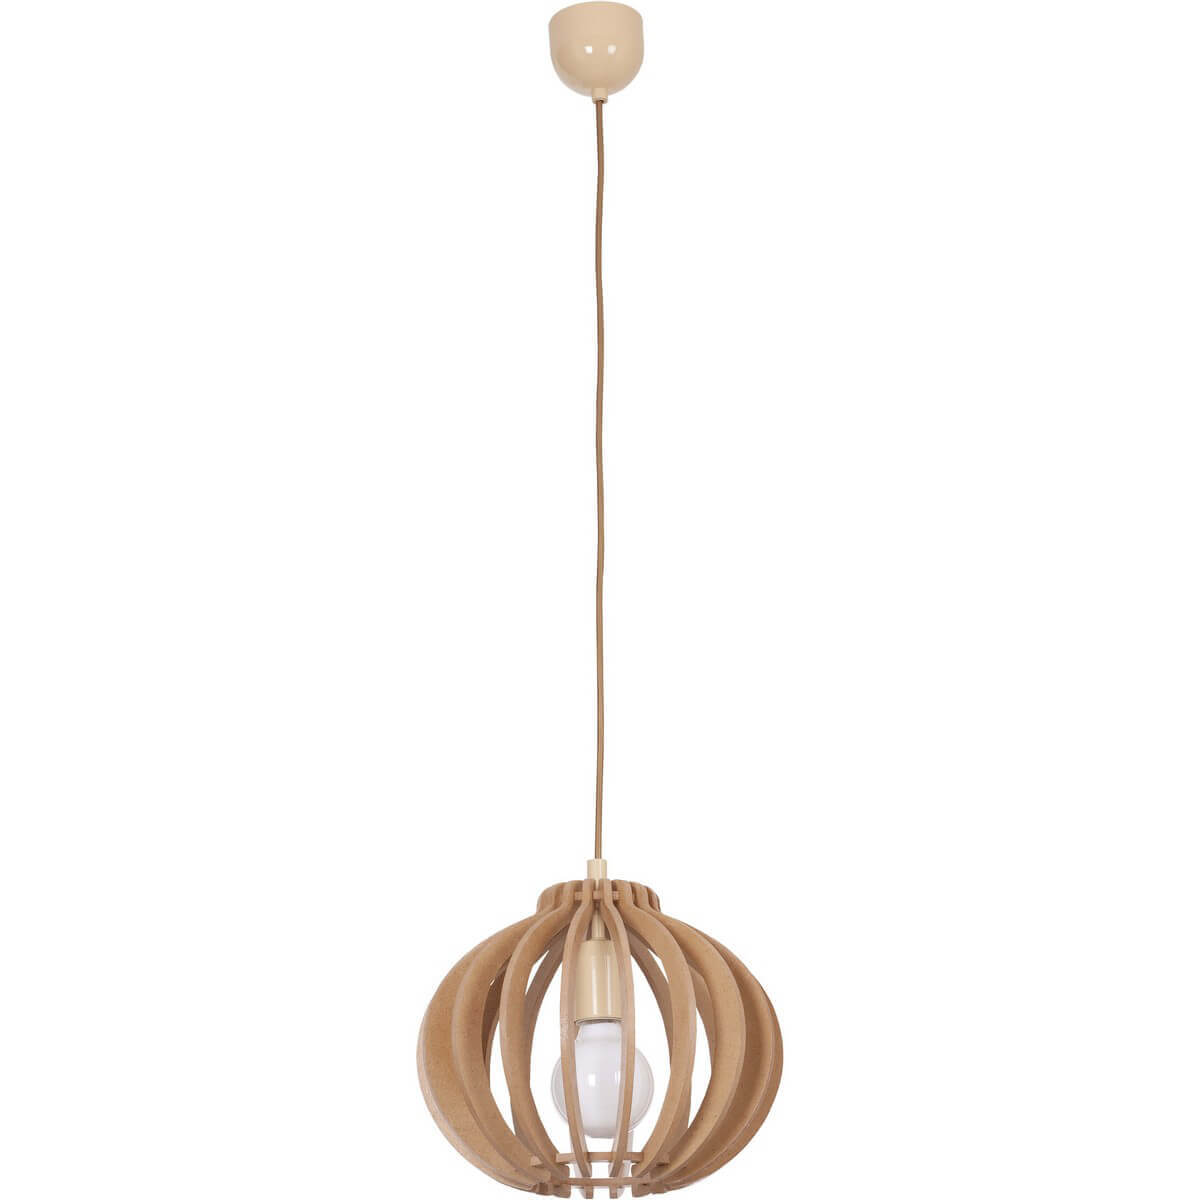 цена на Подвесной светильник Nowodvorski Ika 4173